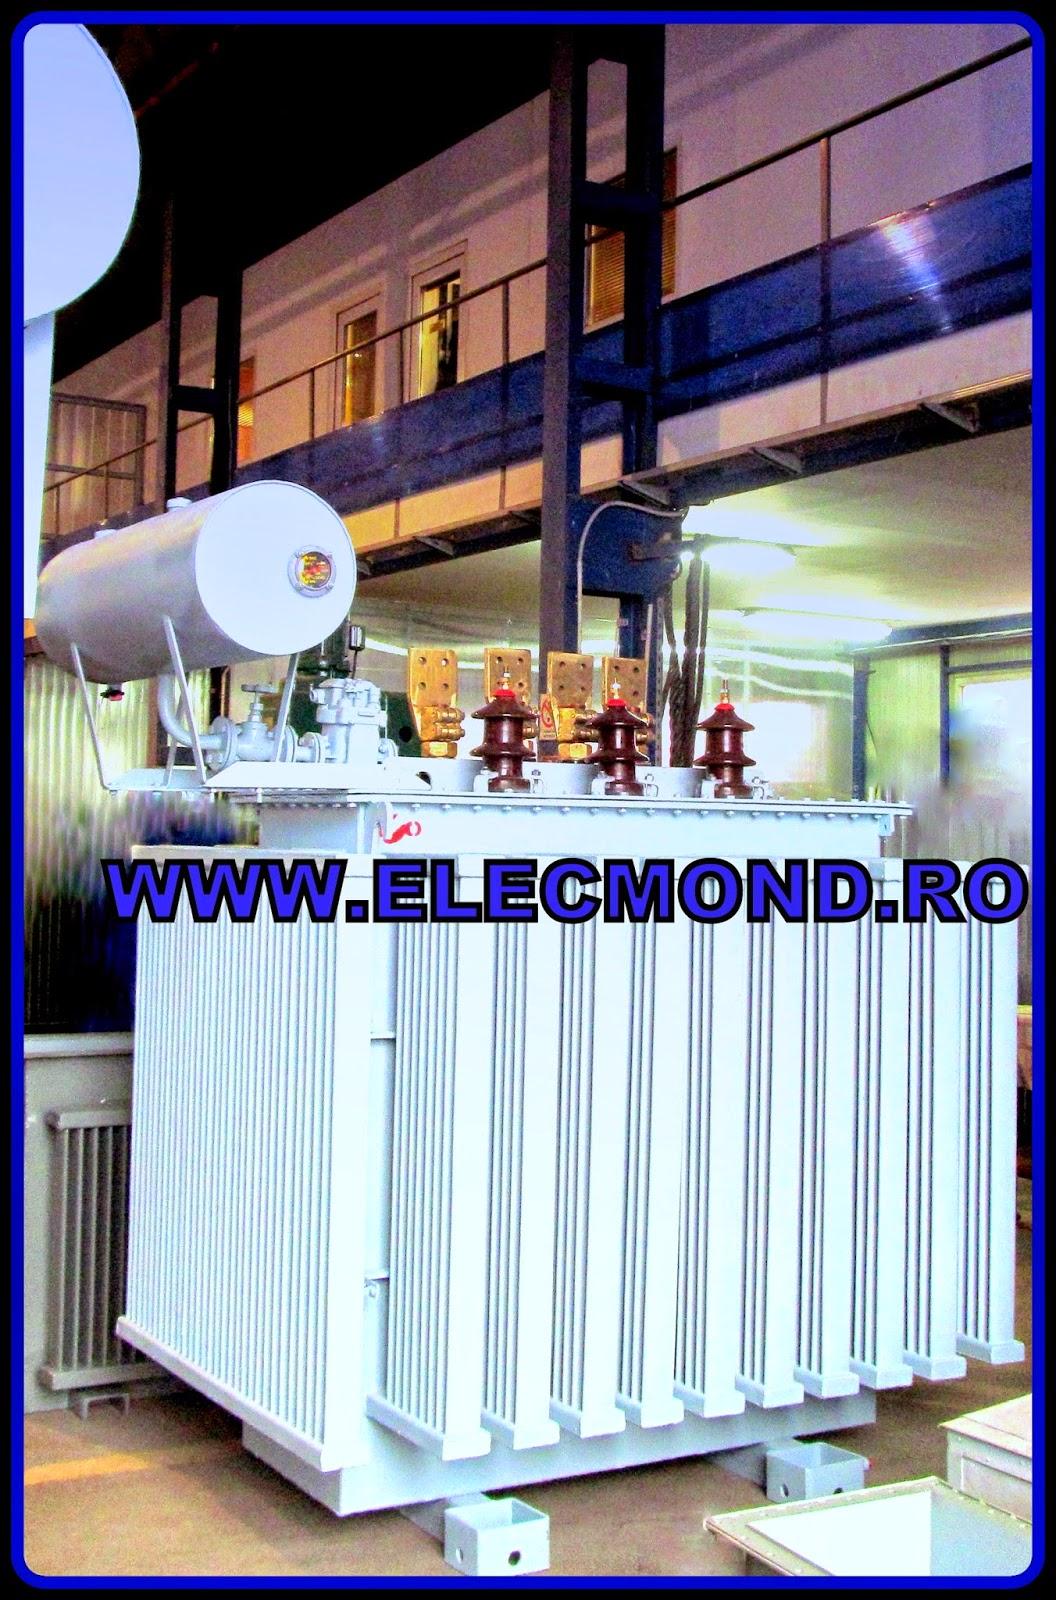 TRANSFORMATOARE 1600 kVA 6/0,4kV  , transformator Cupru 1600 kVA 6/0,4kV , transformator Aluminiu 1600 kVA 6/0,4kV ,trafo 1600 kVA , Elecmond Electric , transformatoare , fabrica transformatoare , trafo 1000 kVA 6 04 kV